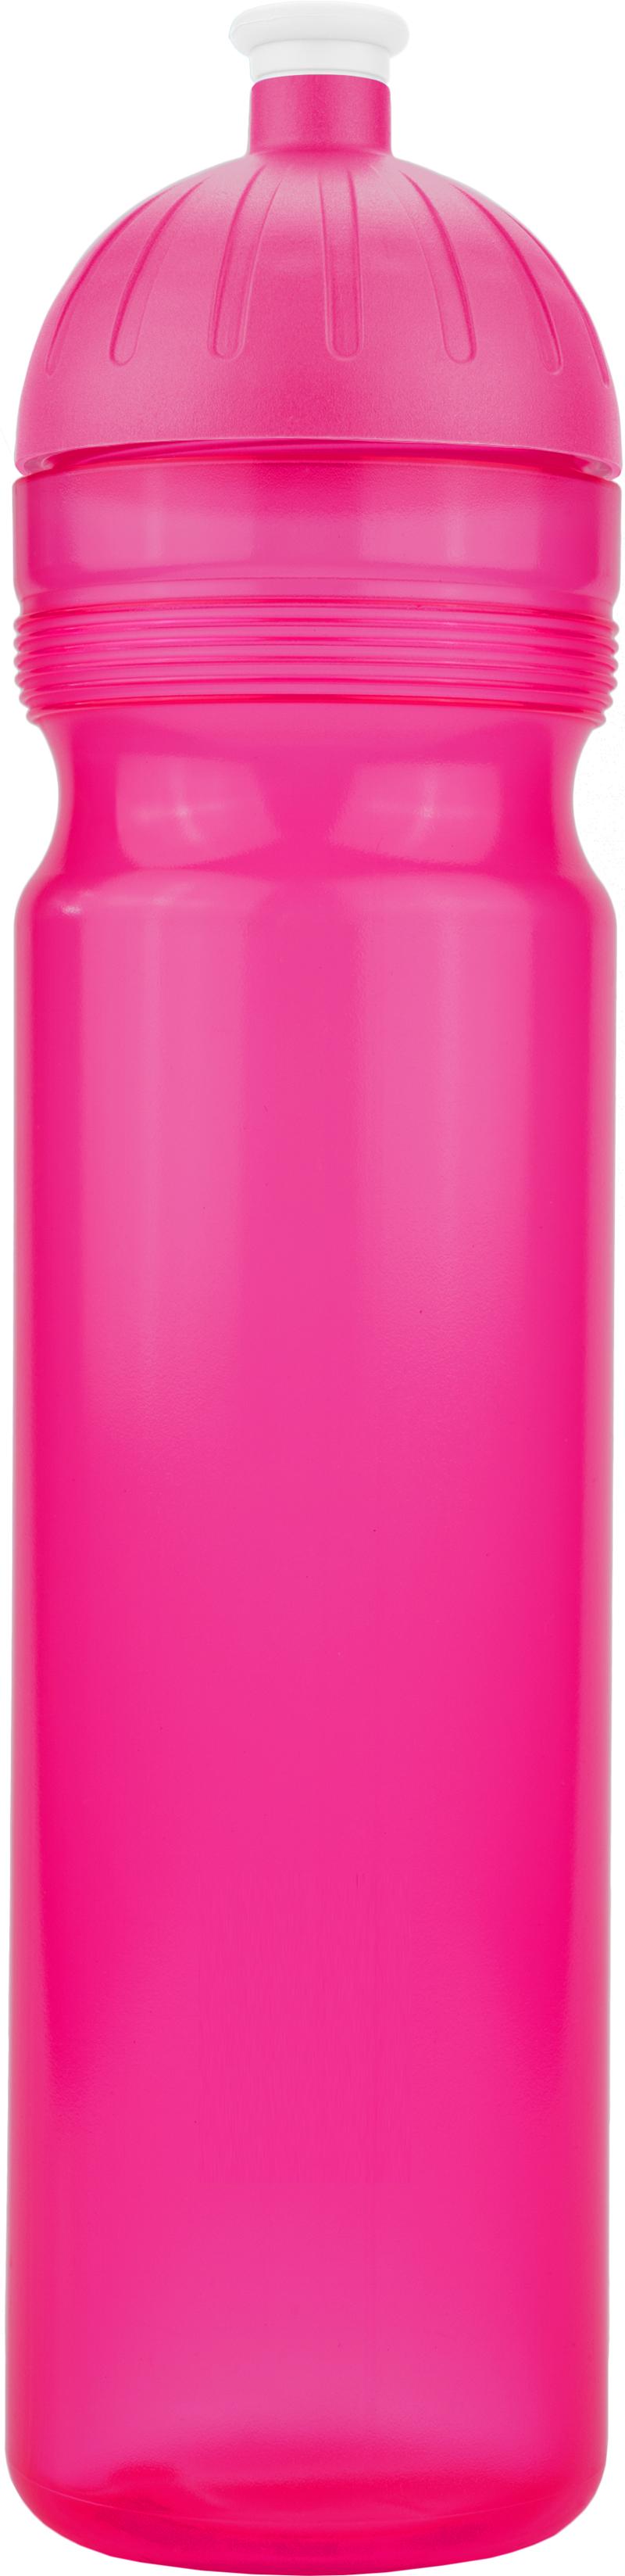 FreeWater lahev 1,0l MALINA, víčko malina